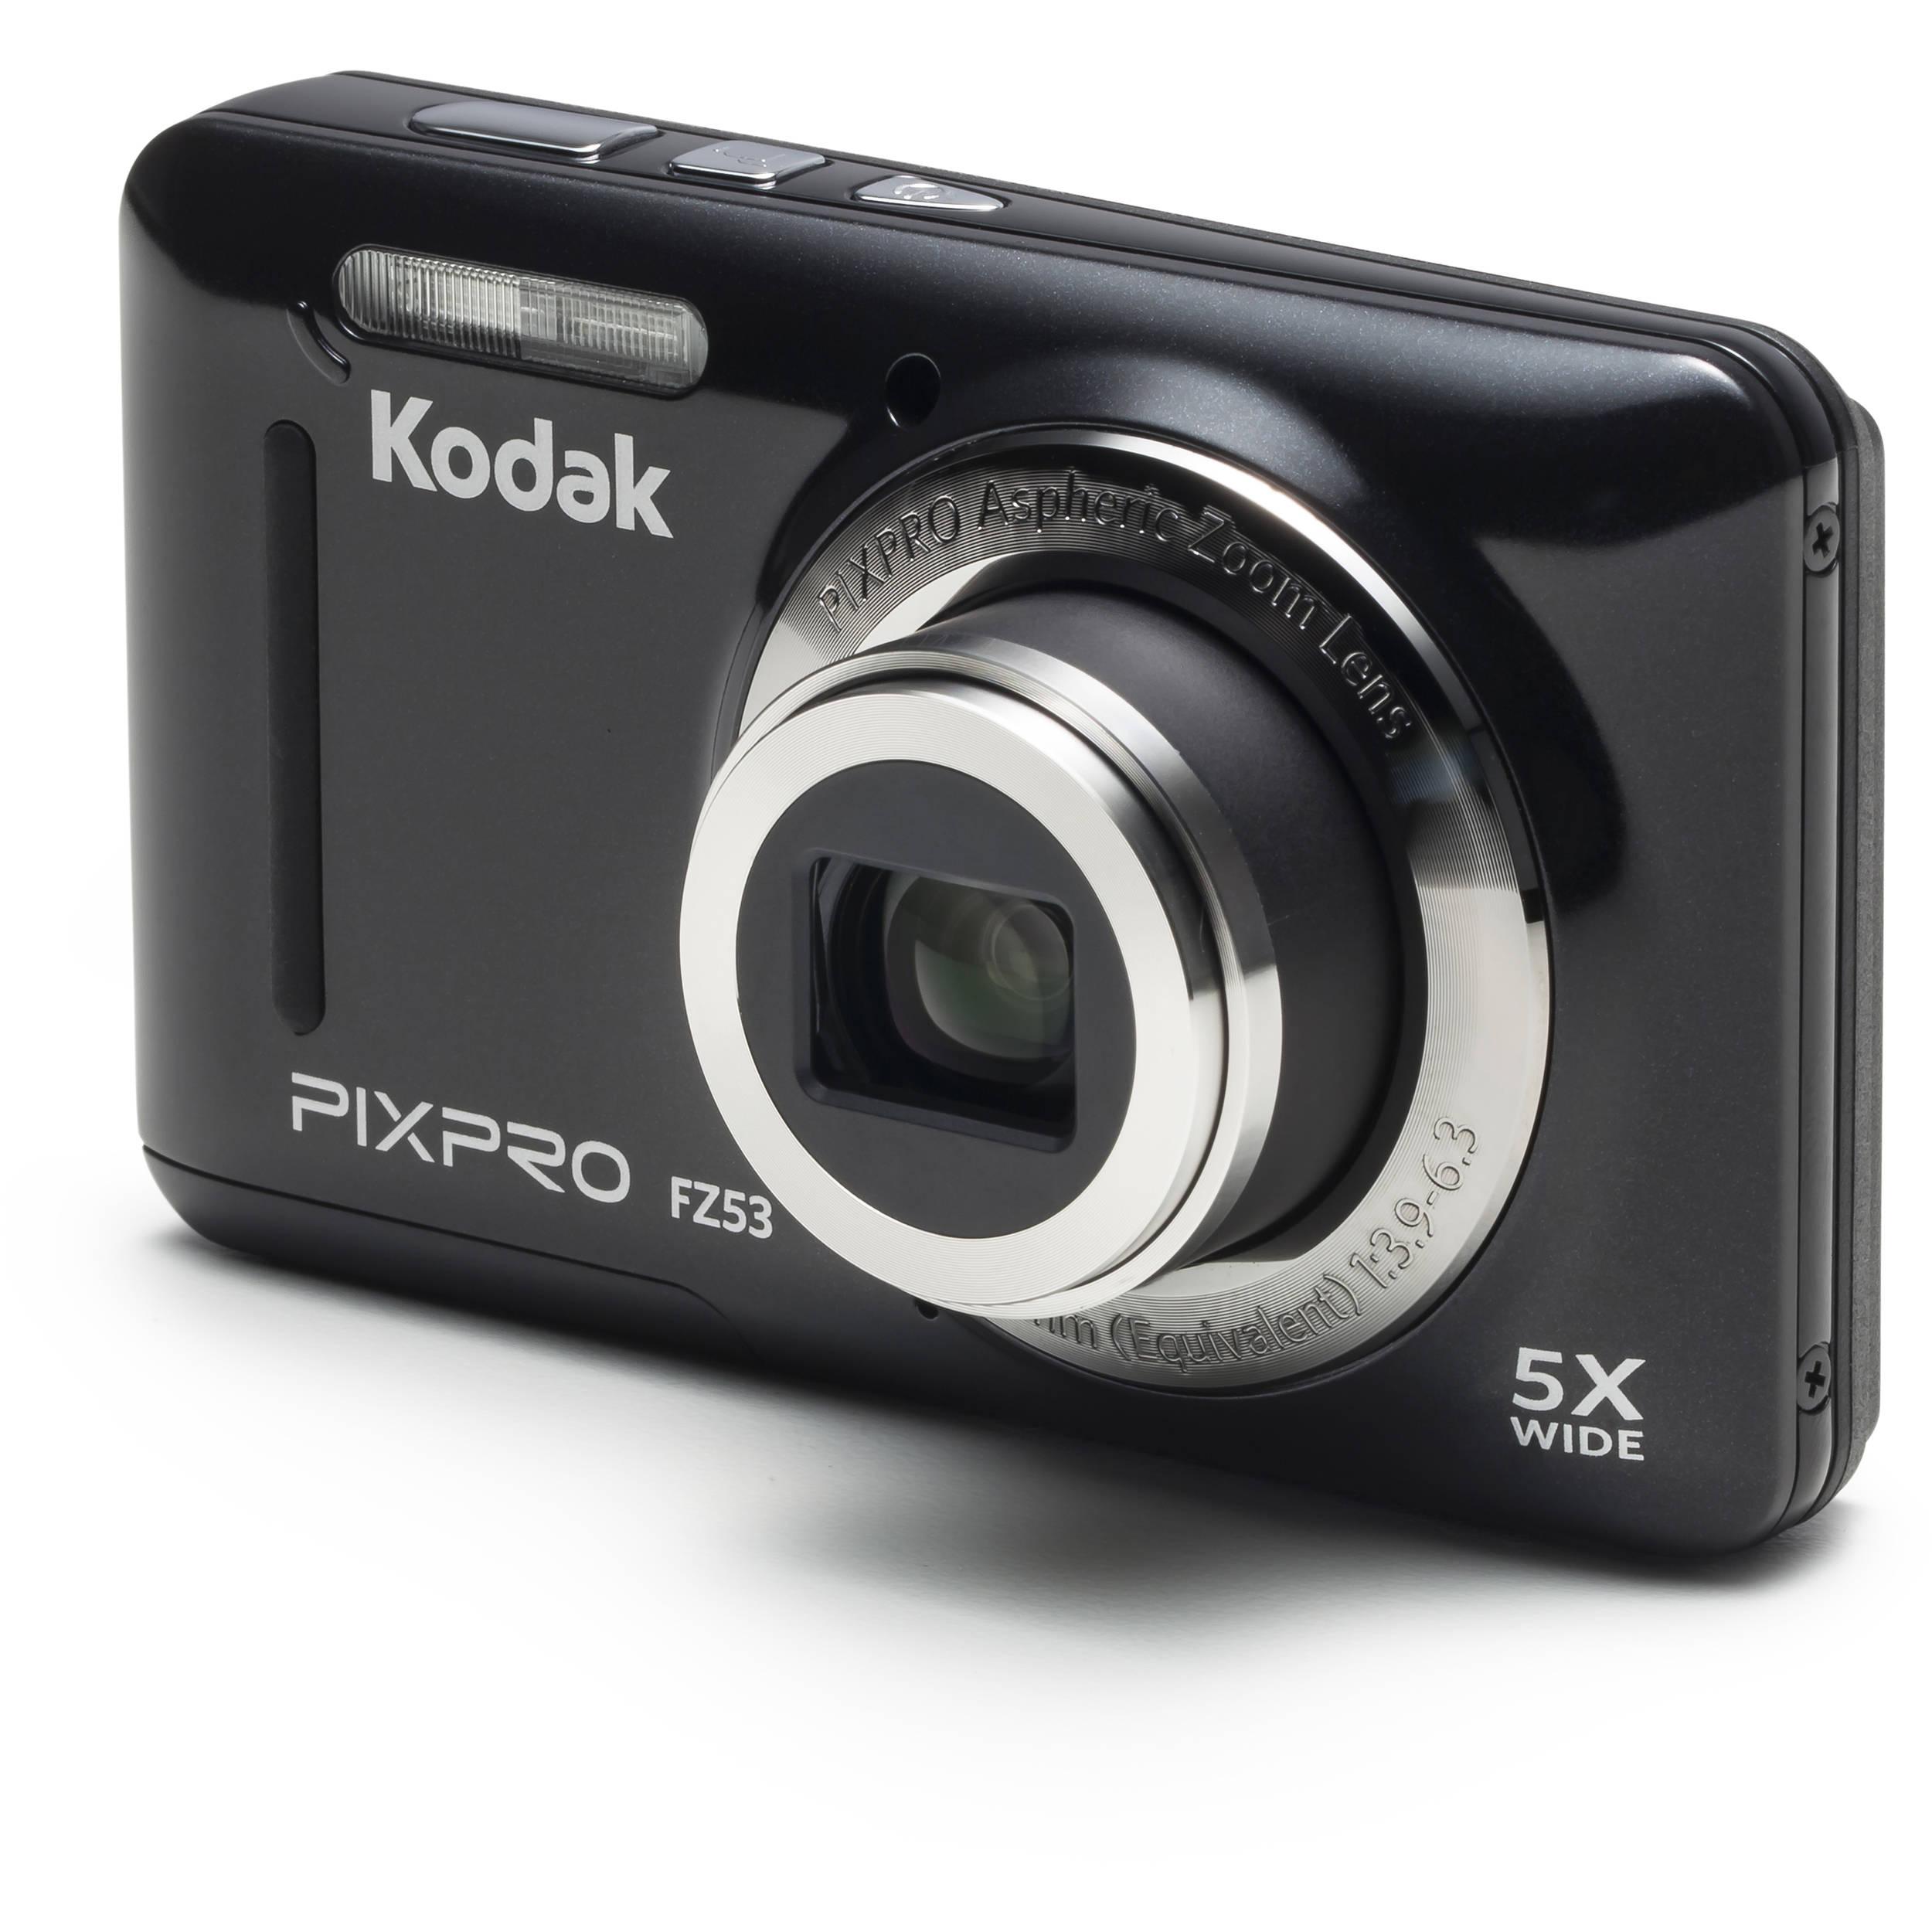 Kodak PIXPRO FZ53 Digital Camera (Black) FZ53-BK B&H Photo Video